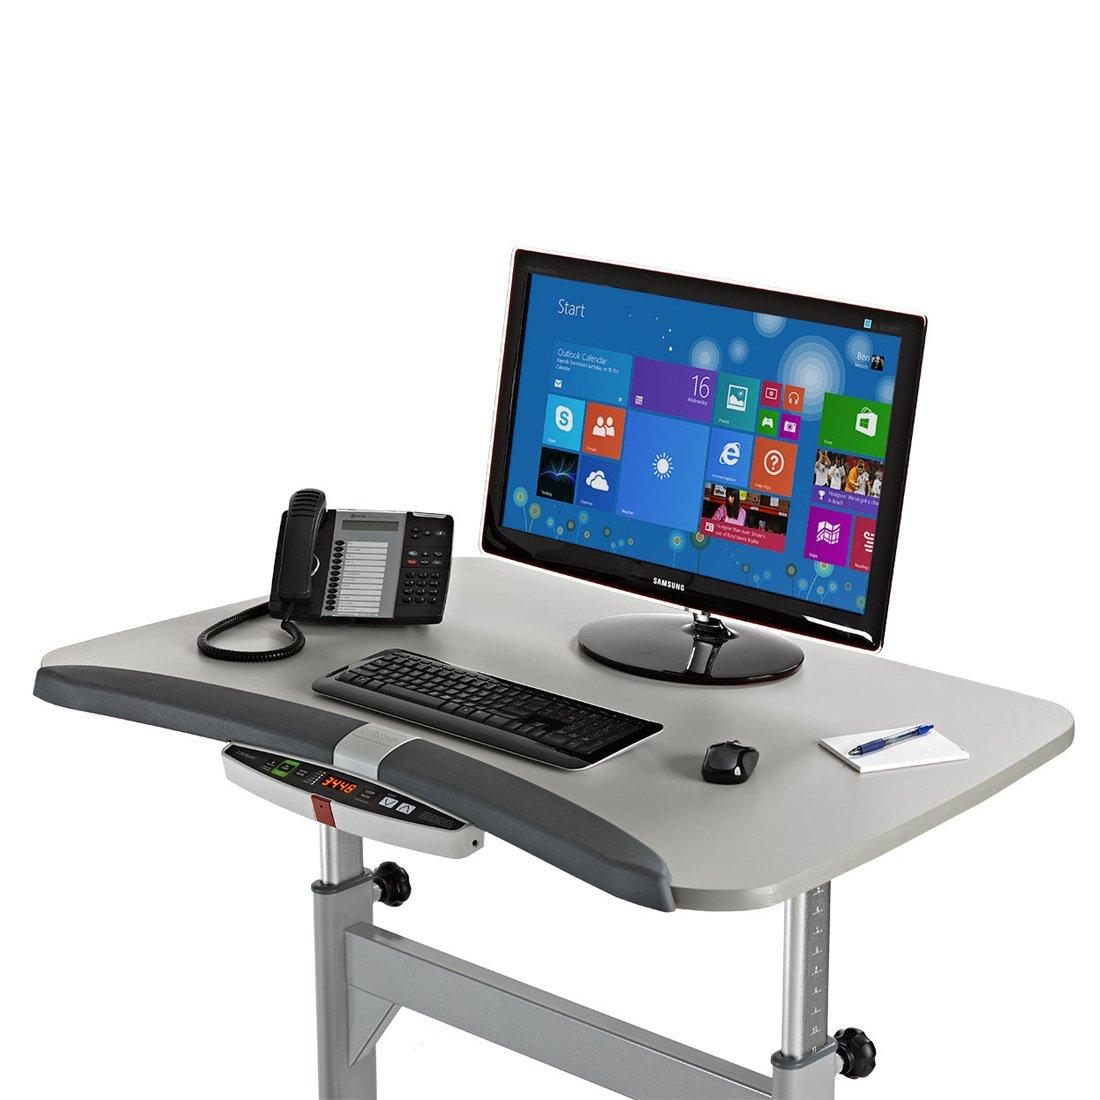 Galleon Lifespan Tr800 Dt5 Treadmill Desk